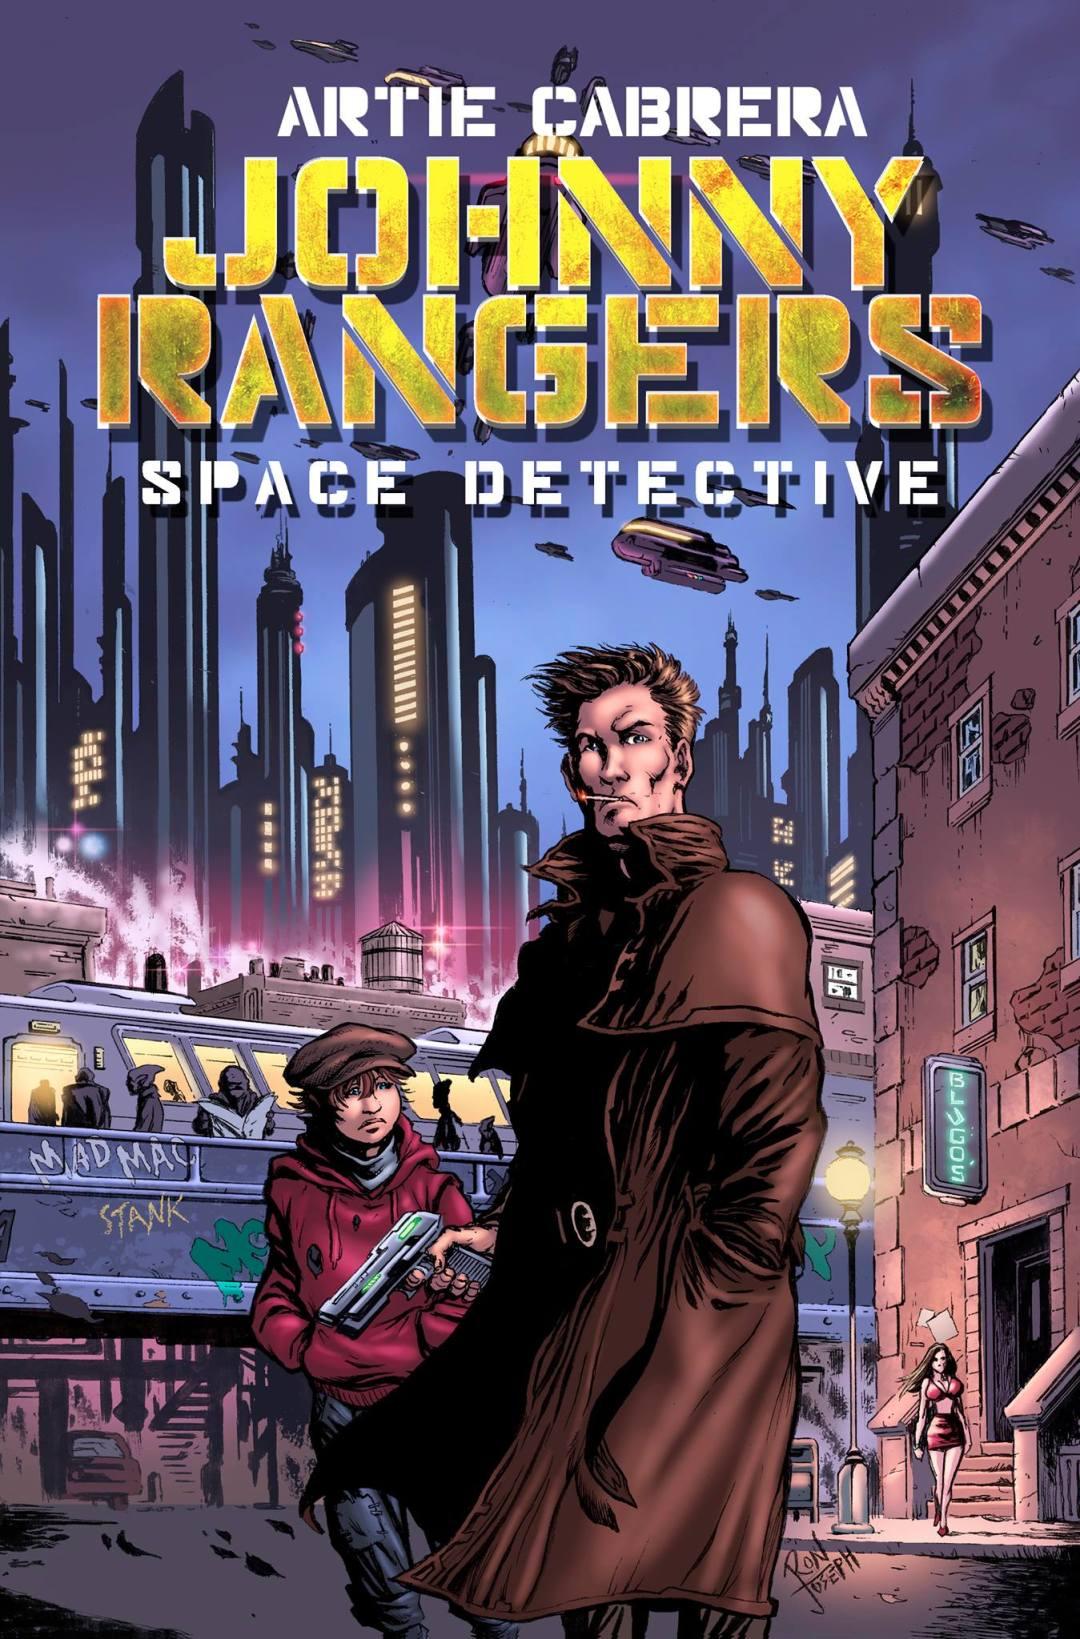 Johnny Rangers Space Detective by Artie Cabrera